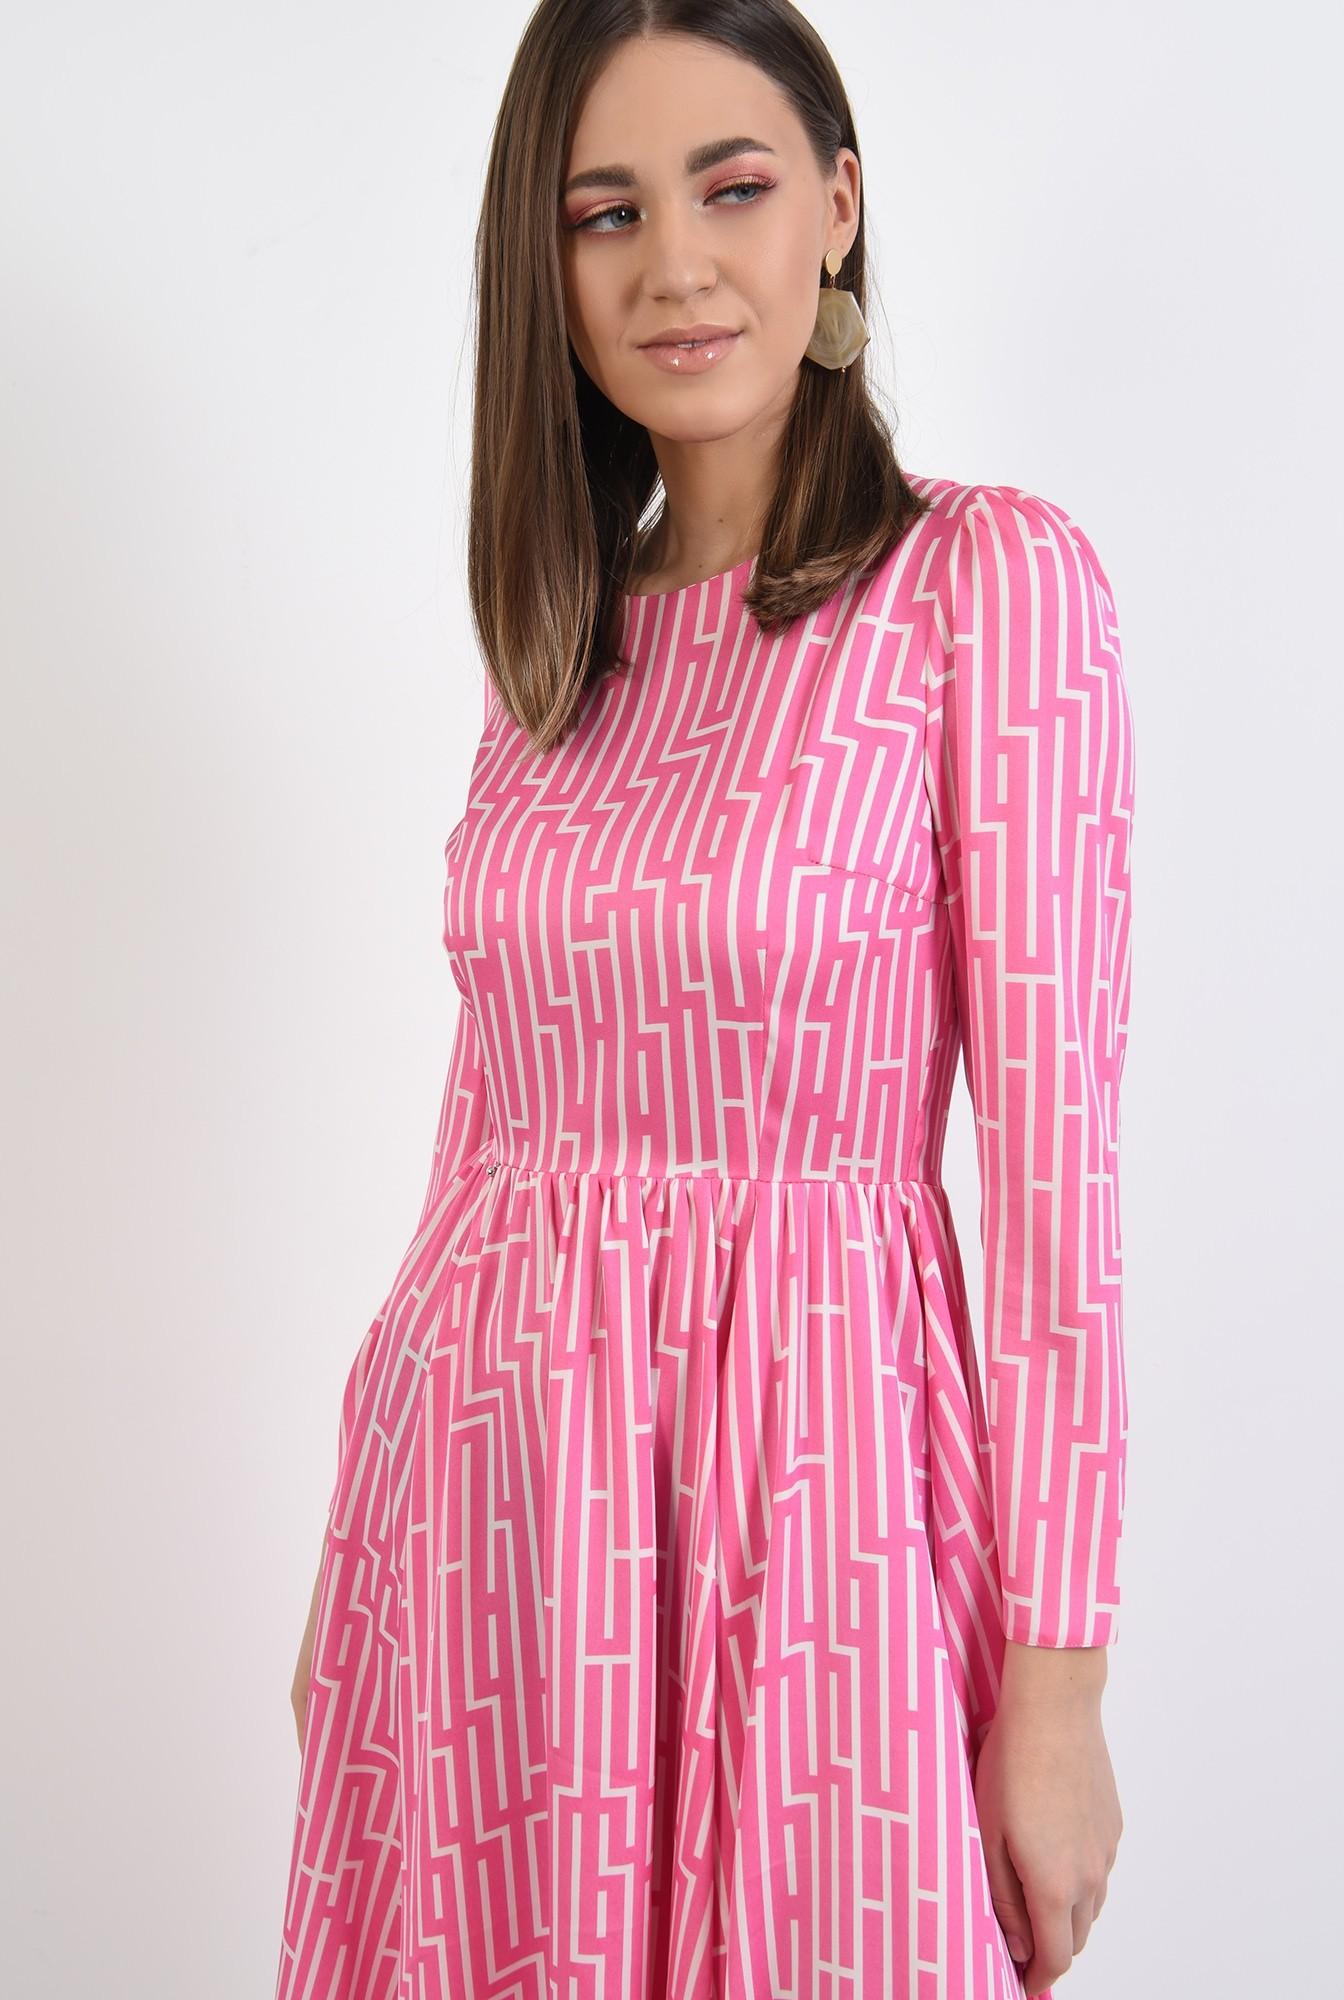 2 - rochie midi, evazata, cu motive geometrice, maneci lungi, roz